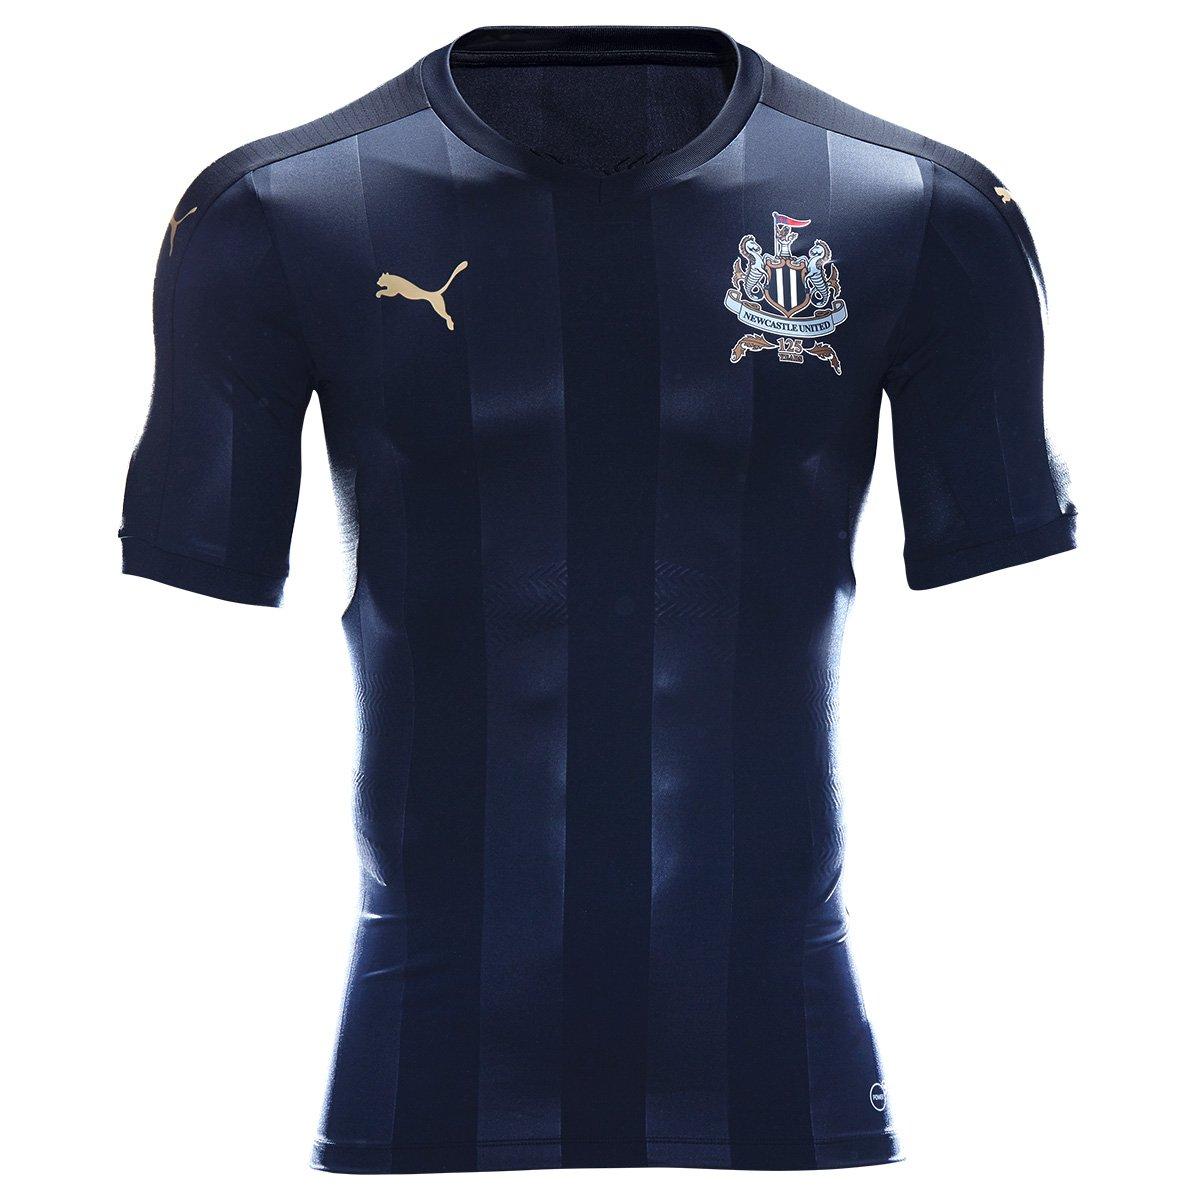 Camisa Newcastle United Third 17 18 s nº - Torcedor Puma Masculina - Compre  Agora  b0b0d91b8ca41